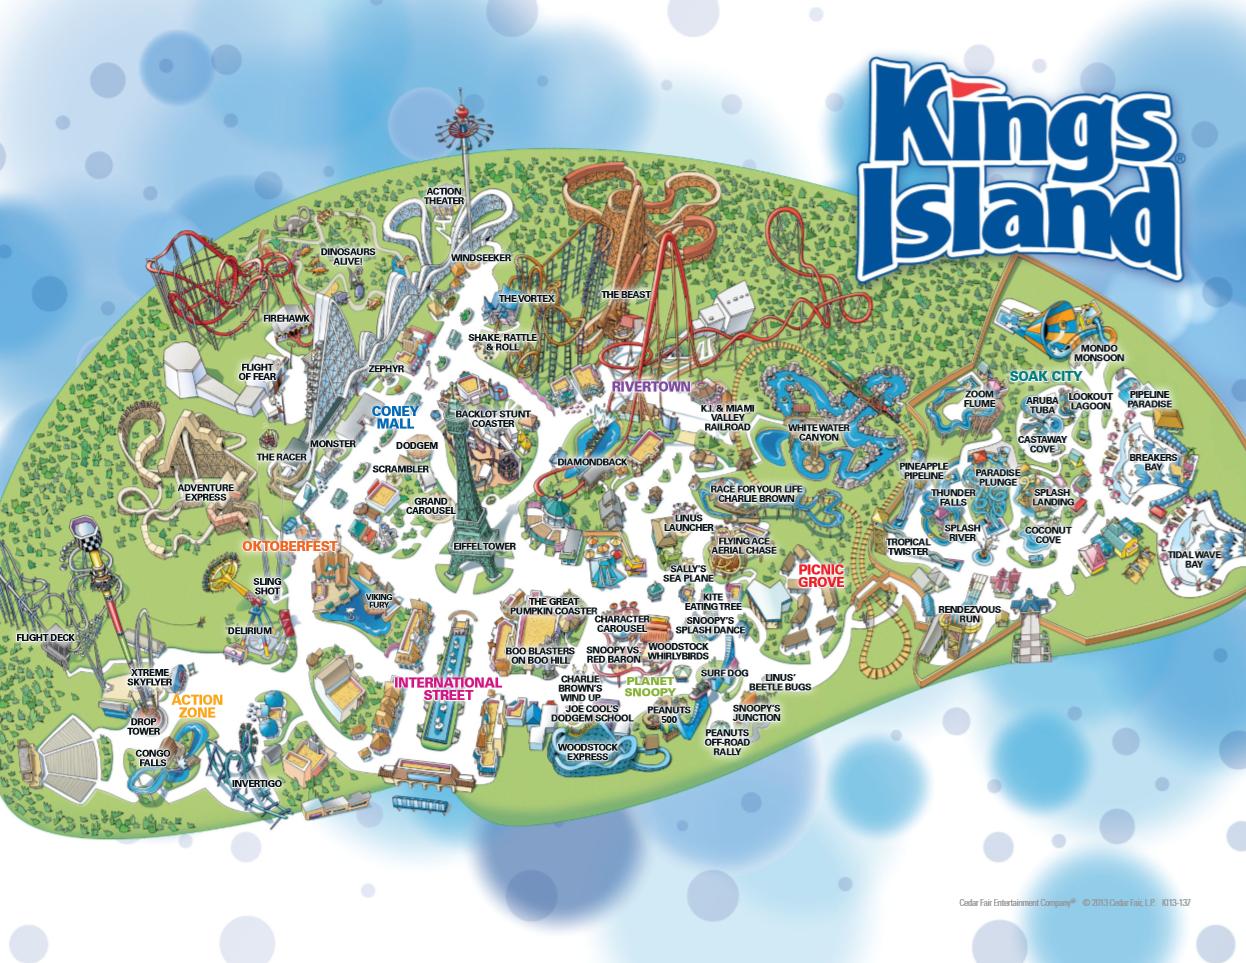 2013 Kings Island Map Soak City Kings Island Island Map